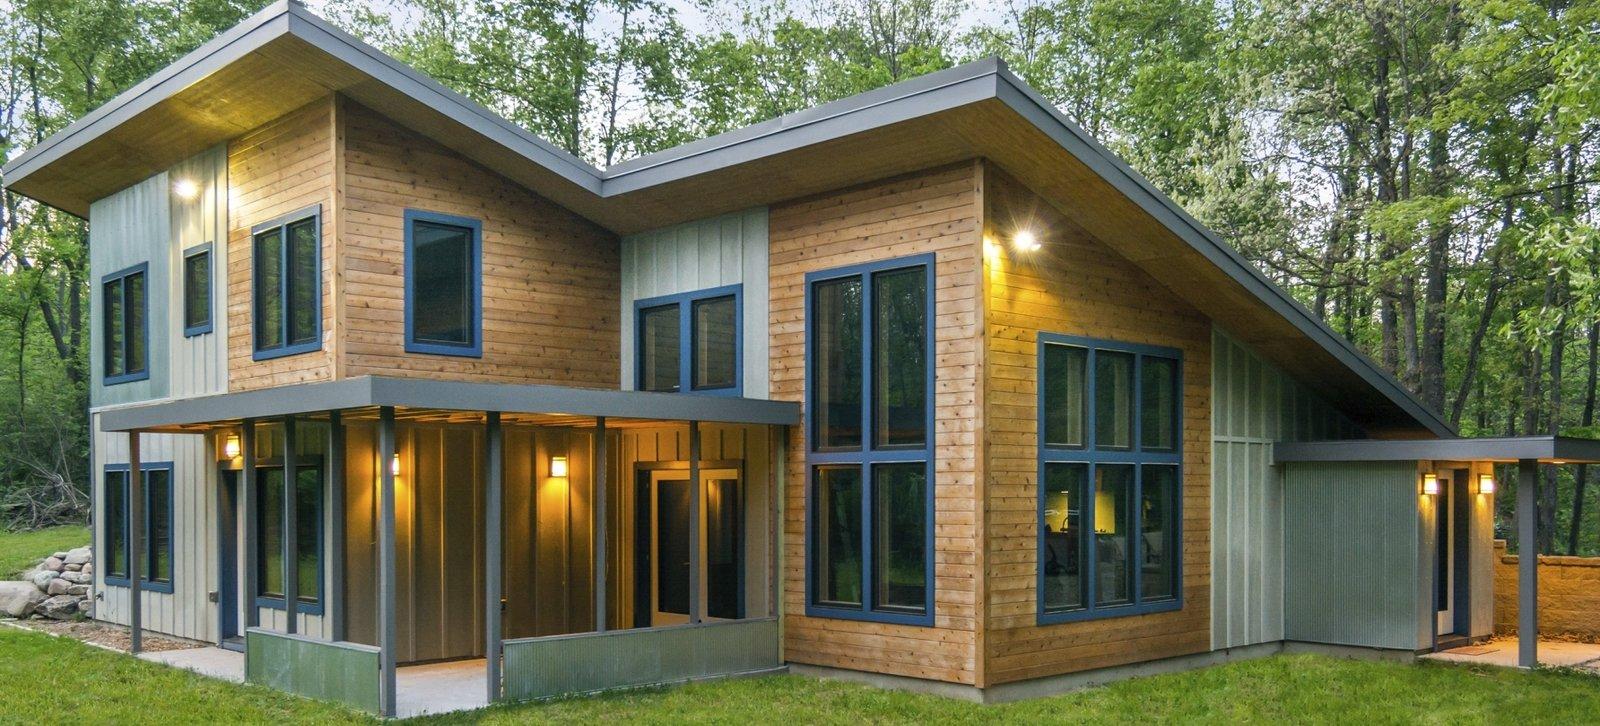 Passive Solar Home - New Build Modern Home in Ann Arbor ...